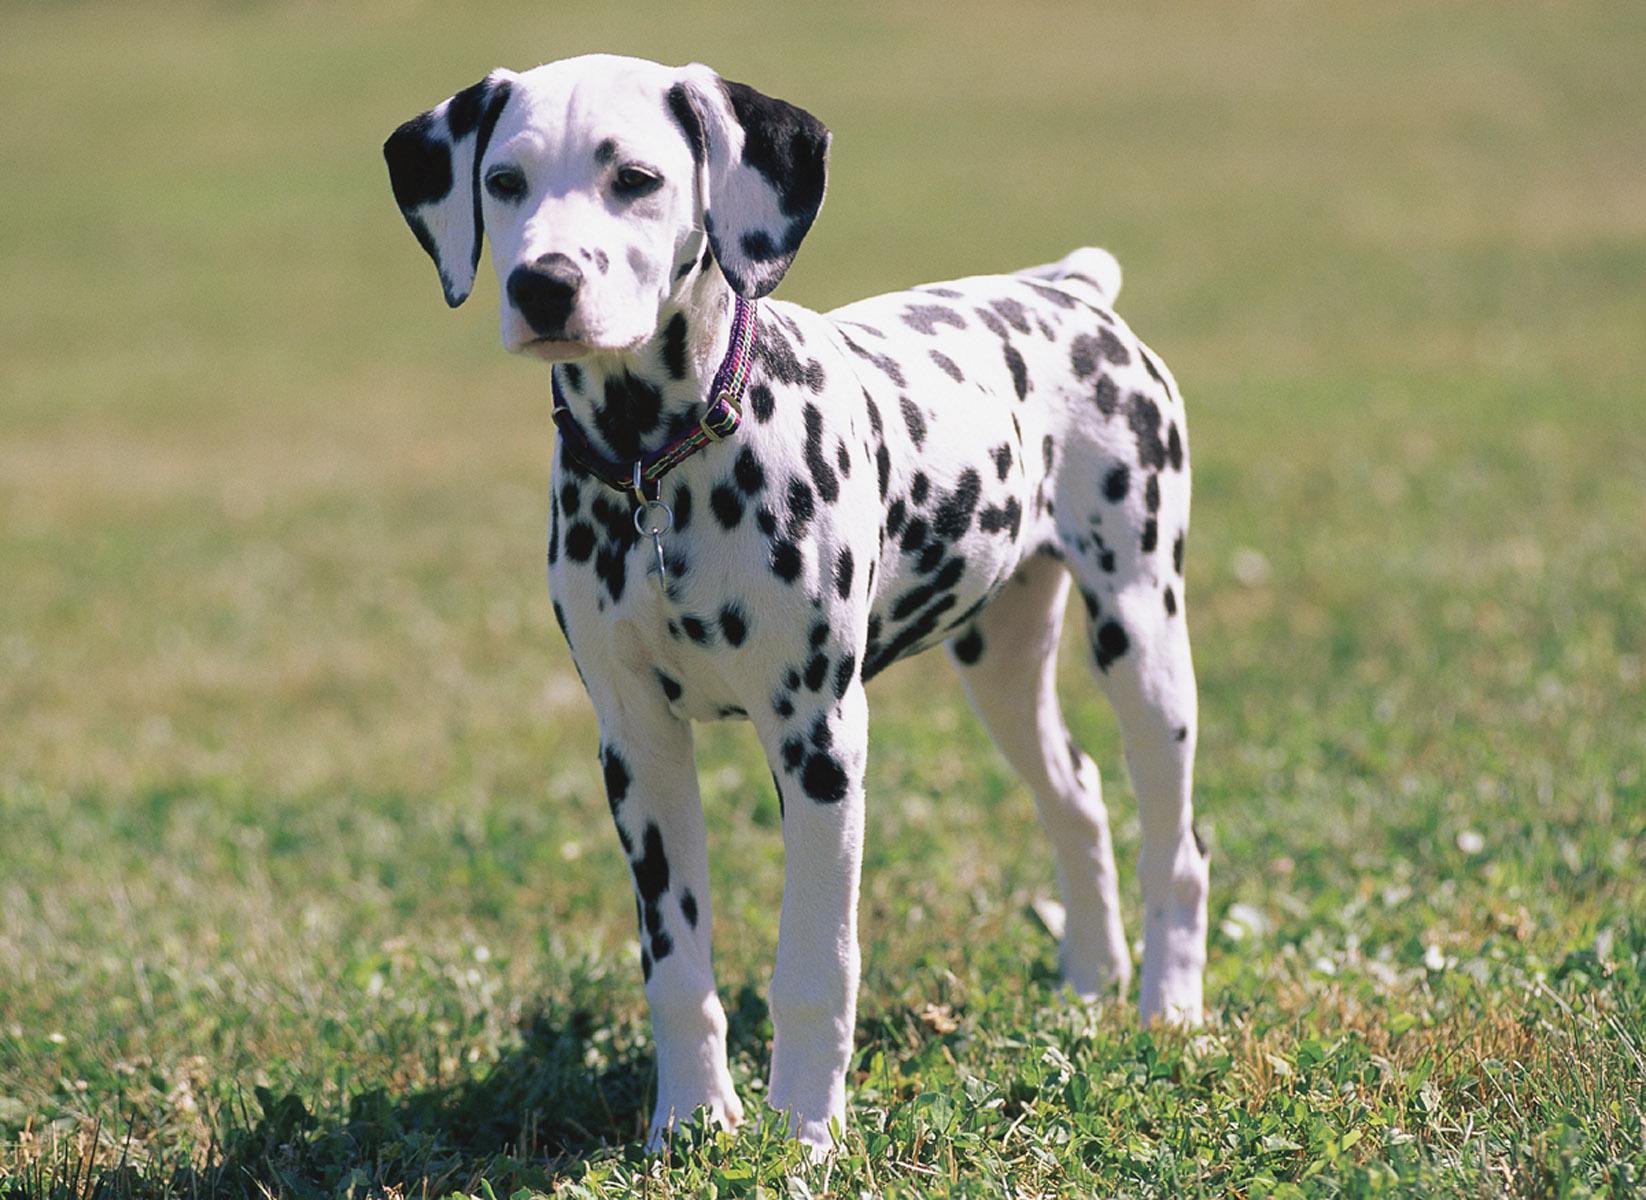 بالصور صور كلاب صور كلاب جديدة , خلفيات لكلب حراسه 4052 4